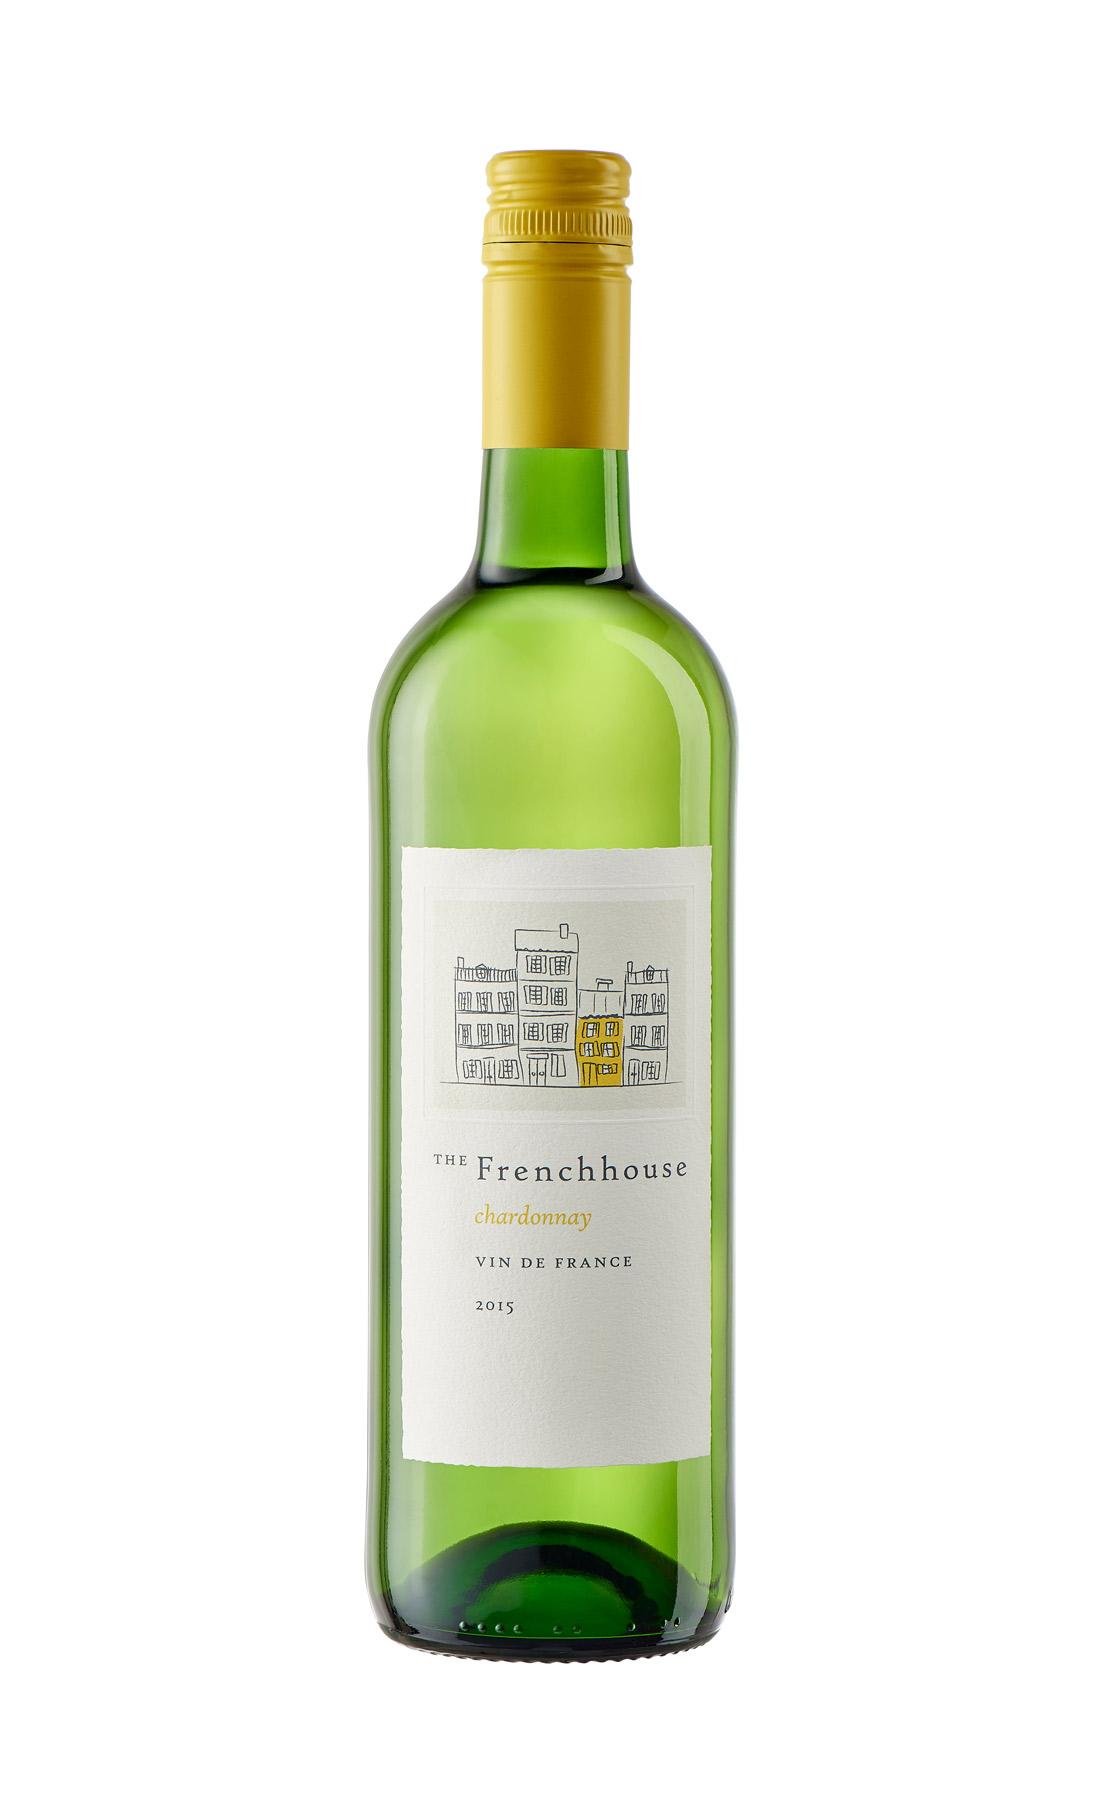 The Frenchhouse Chardonnay